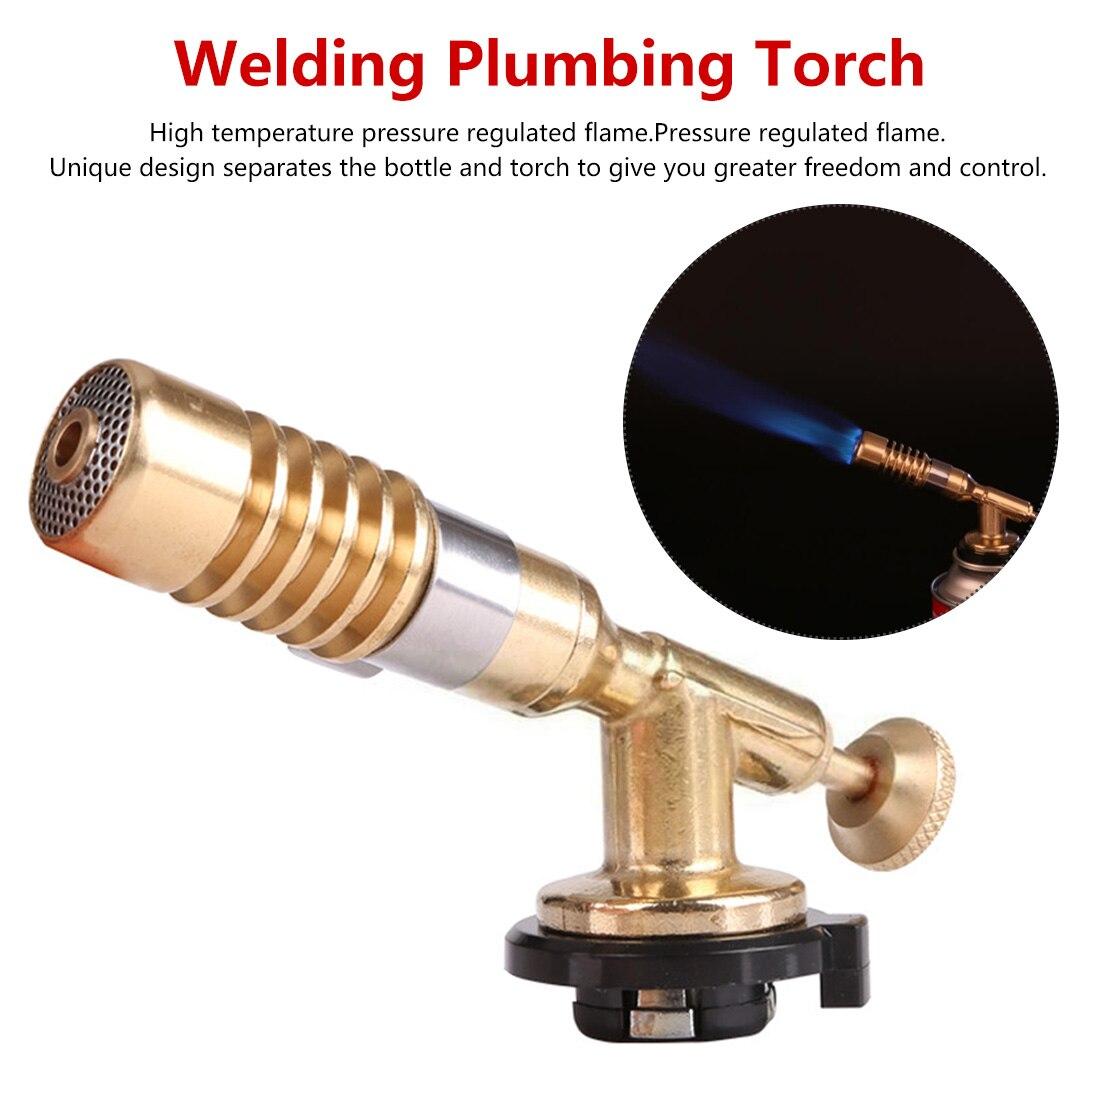 Adjustable Temperature Brass Gas Turbo Torch Aluminum Brazing Propane Weld Plumbing